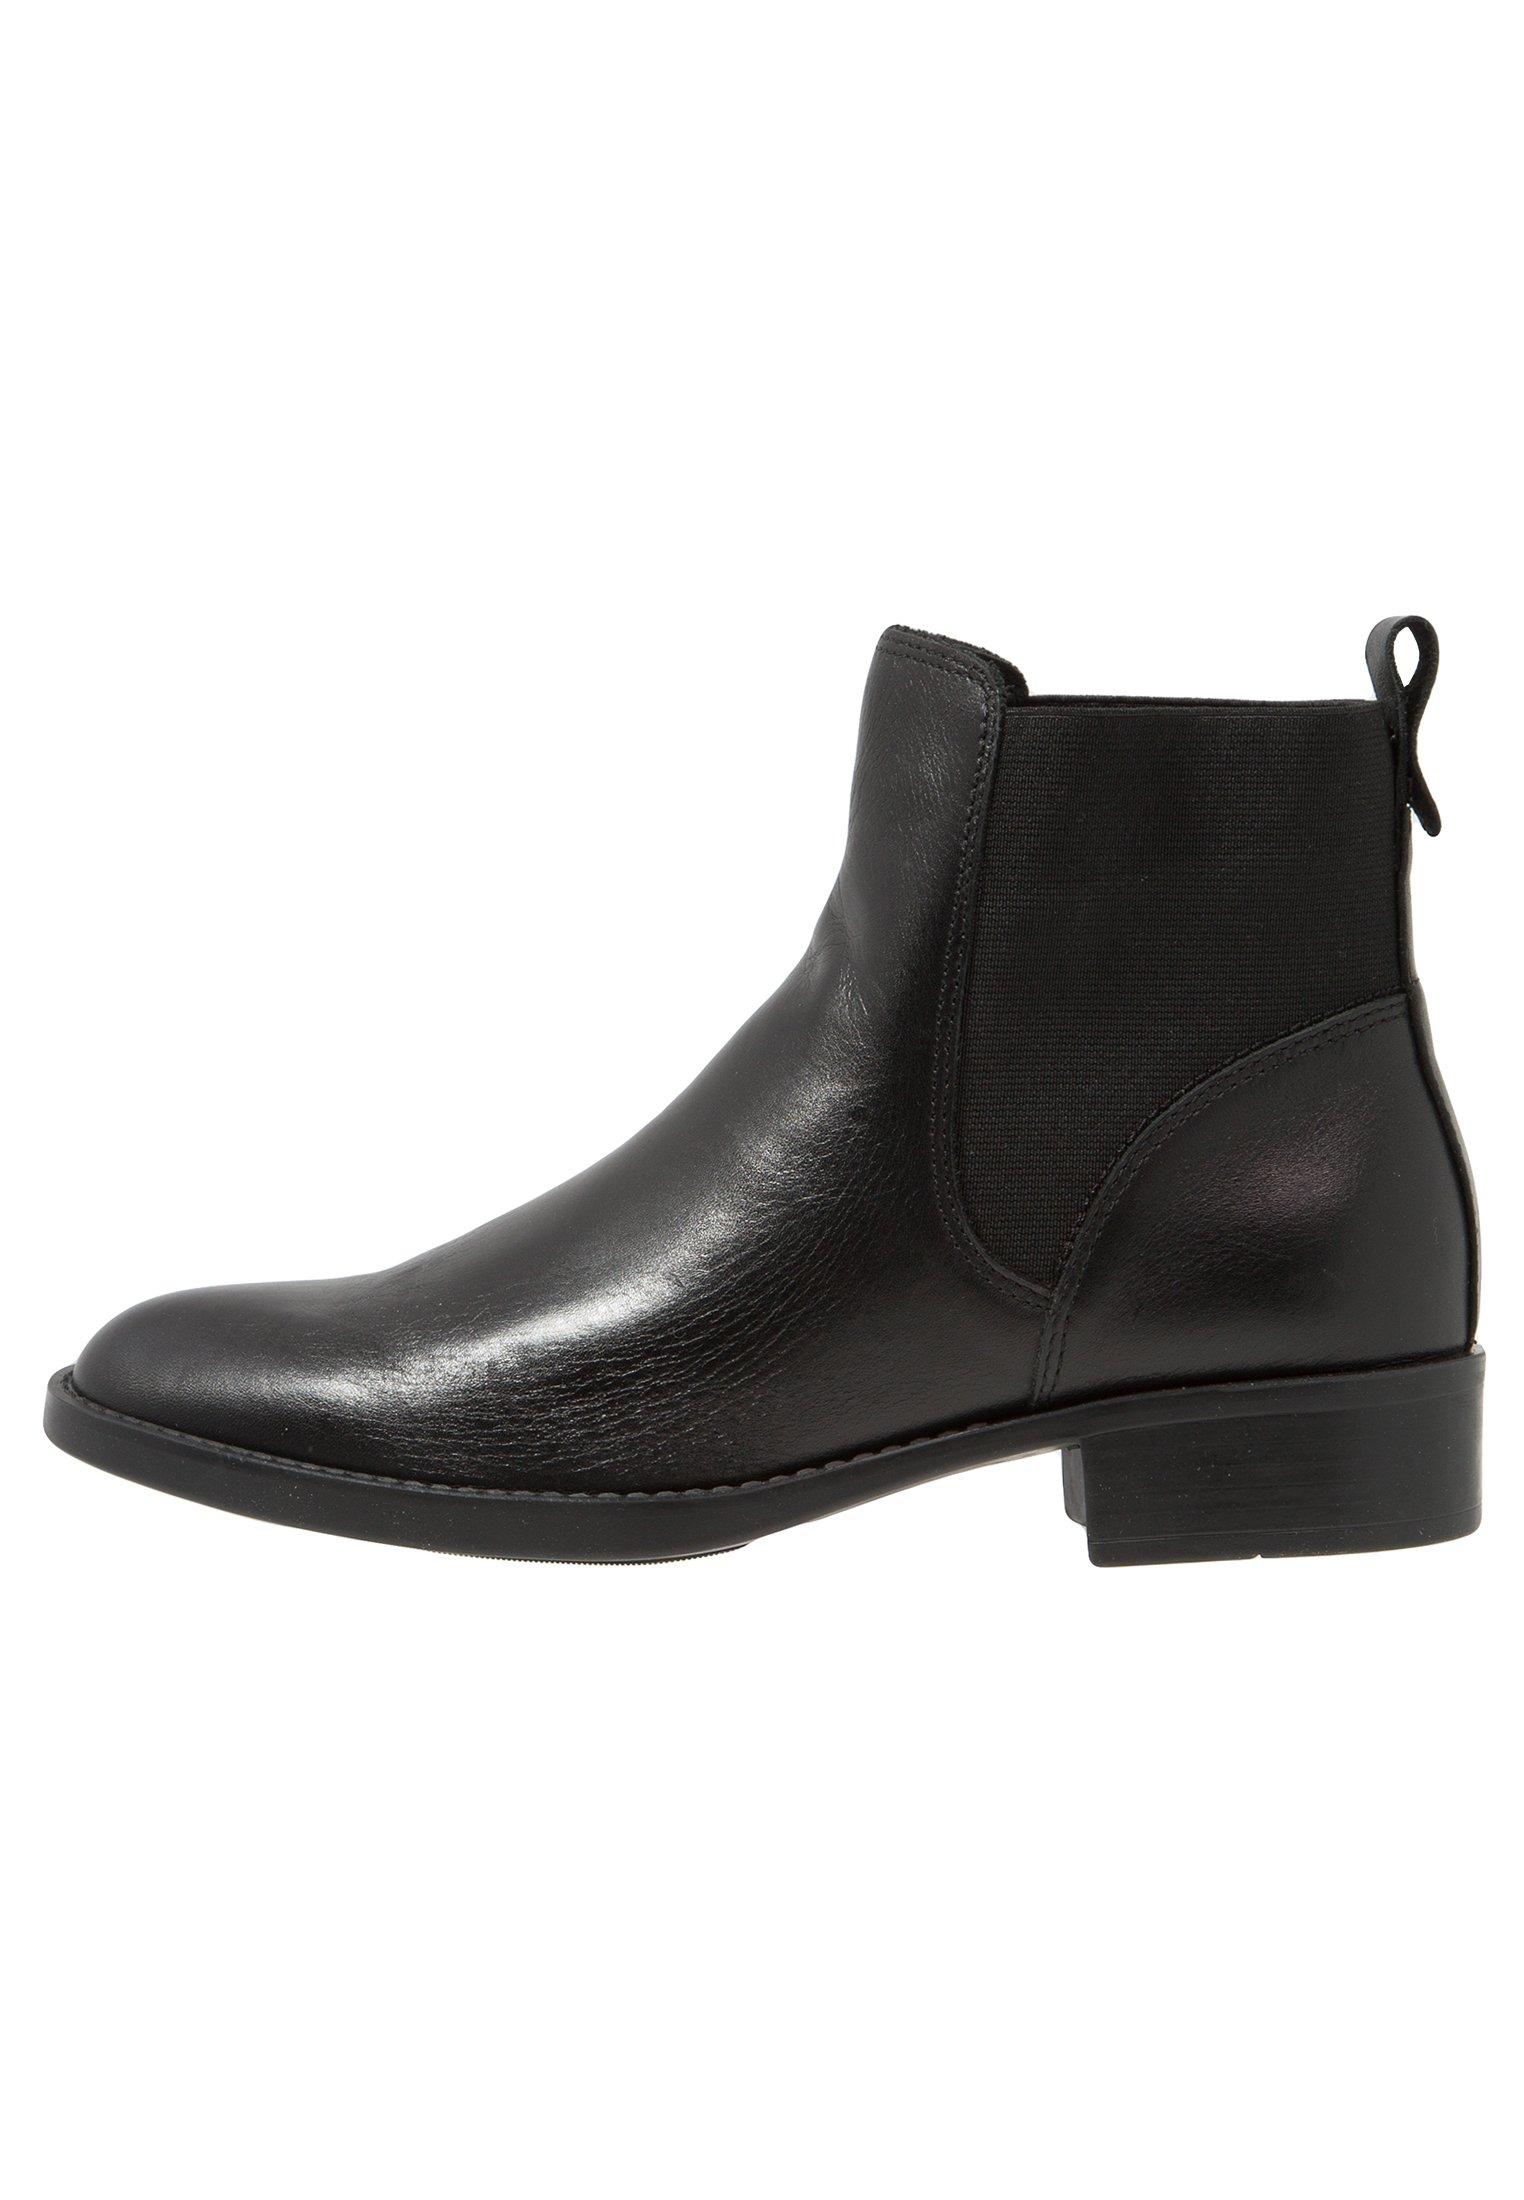 Bianco Chelsea - Ankle Boot Black/schwarz